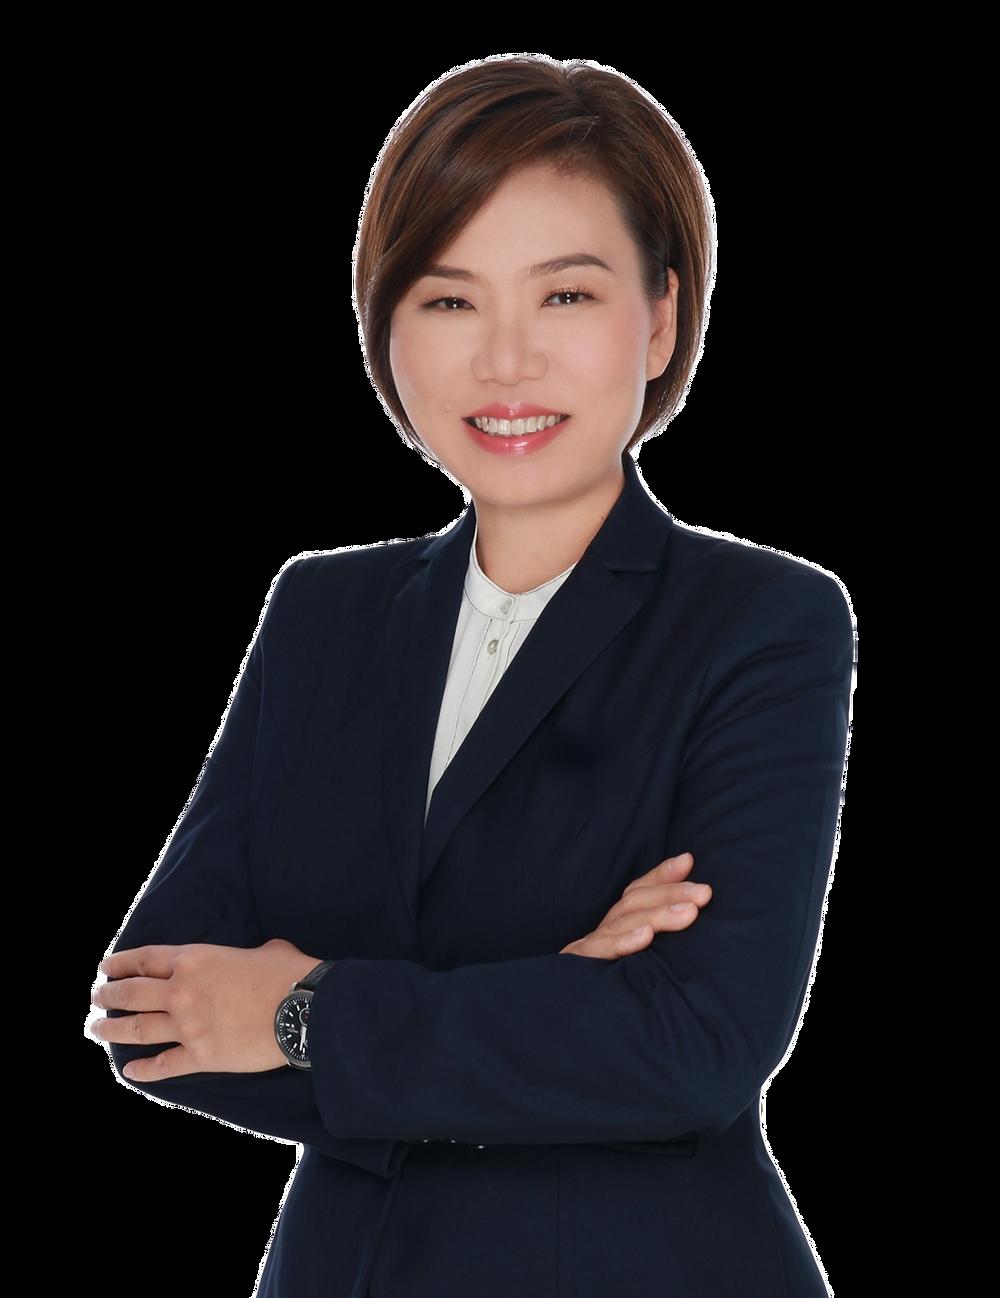 property agent career female leader mentor